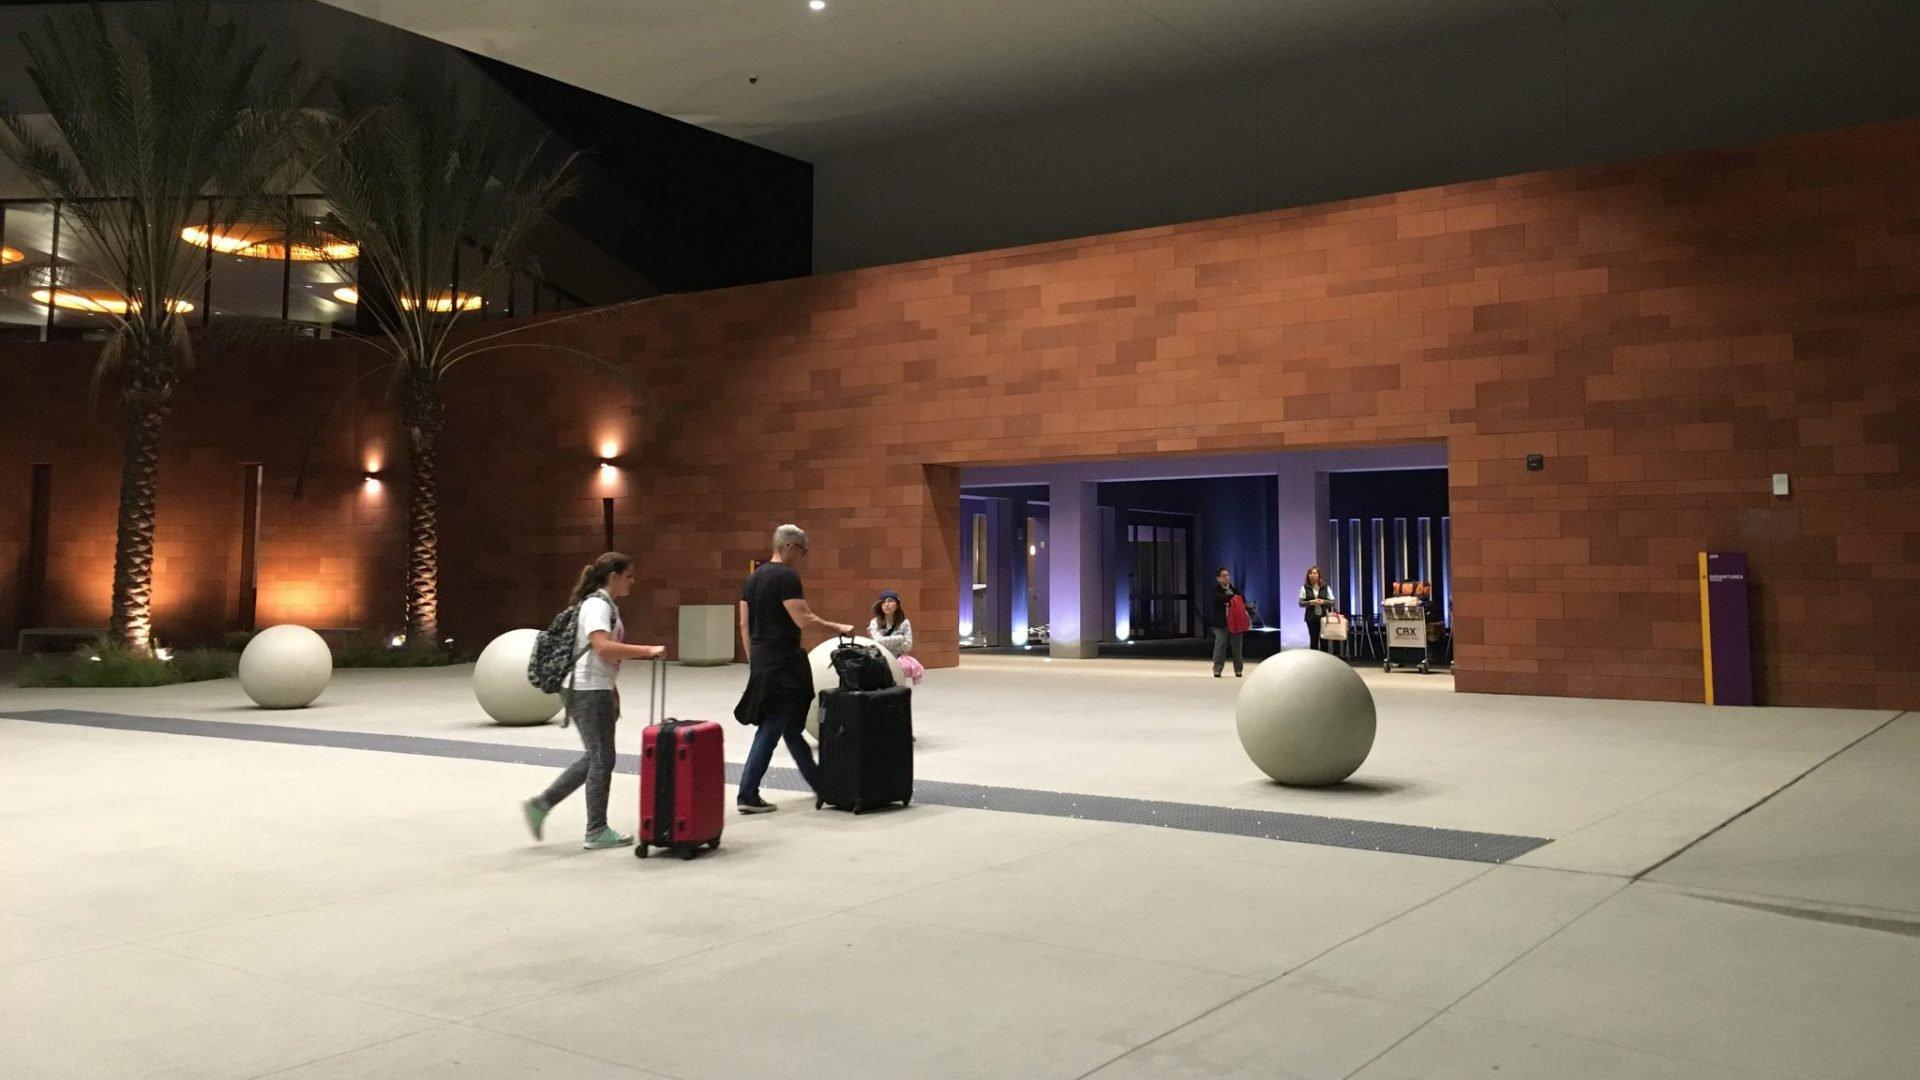 Fly from Tijuana Airport via CBX Cross Border Xpress